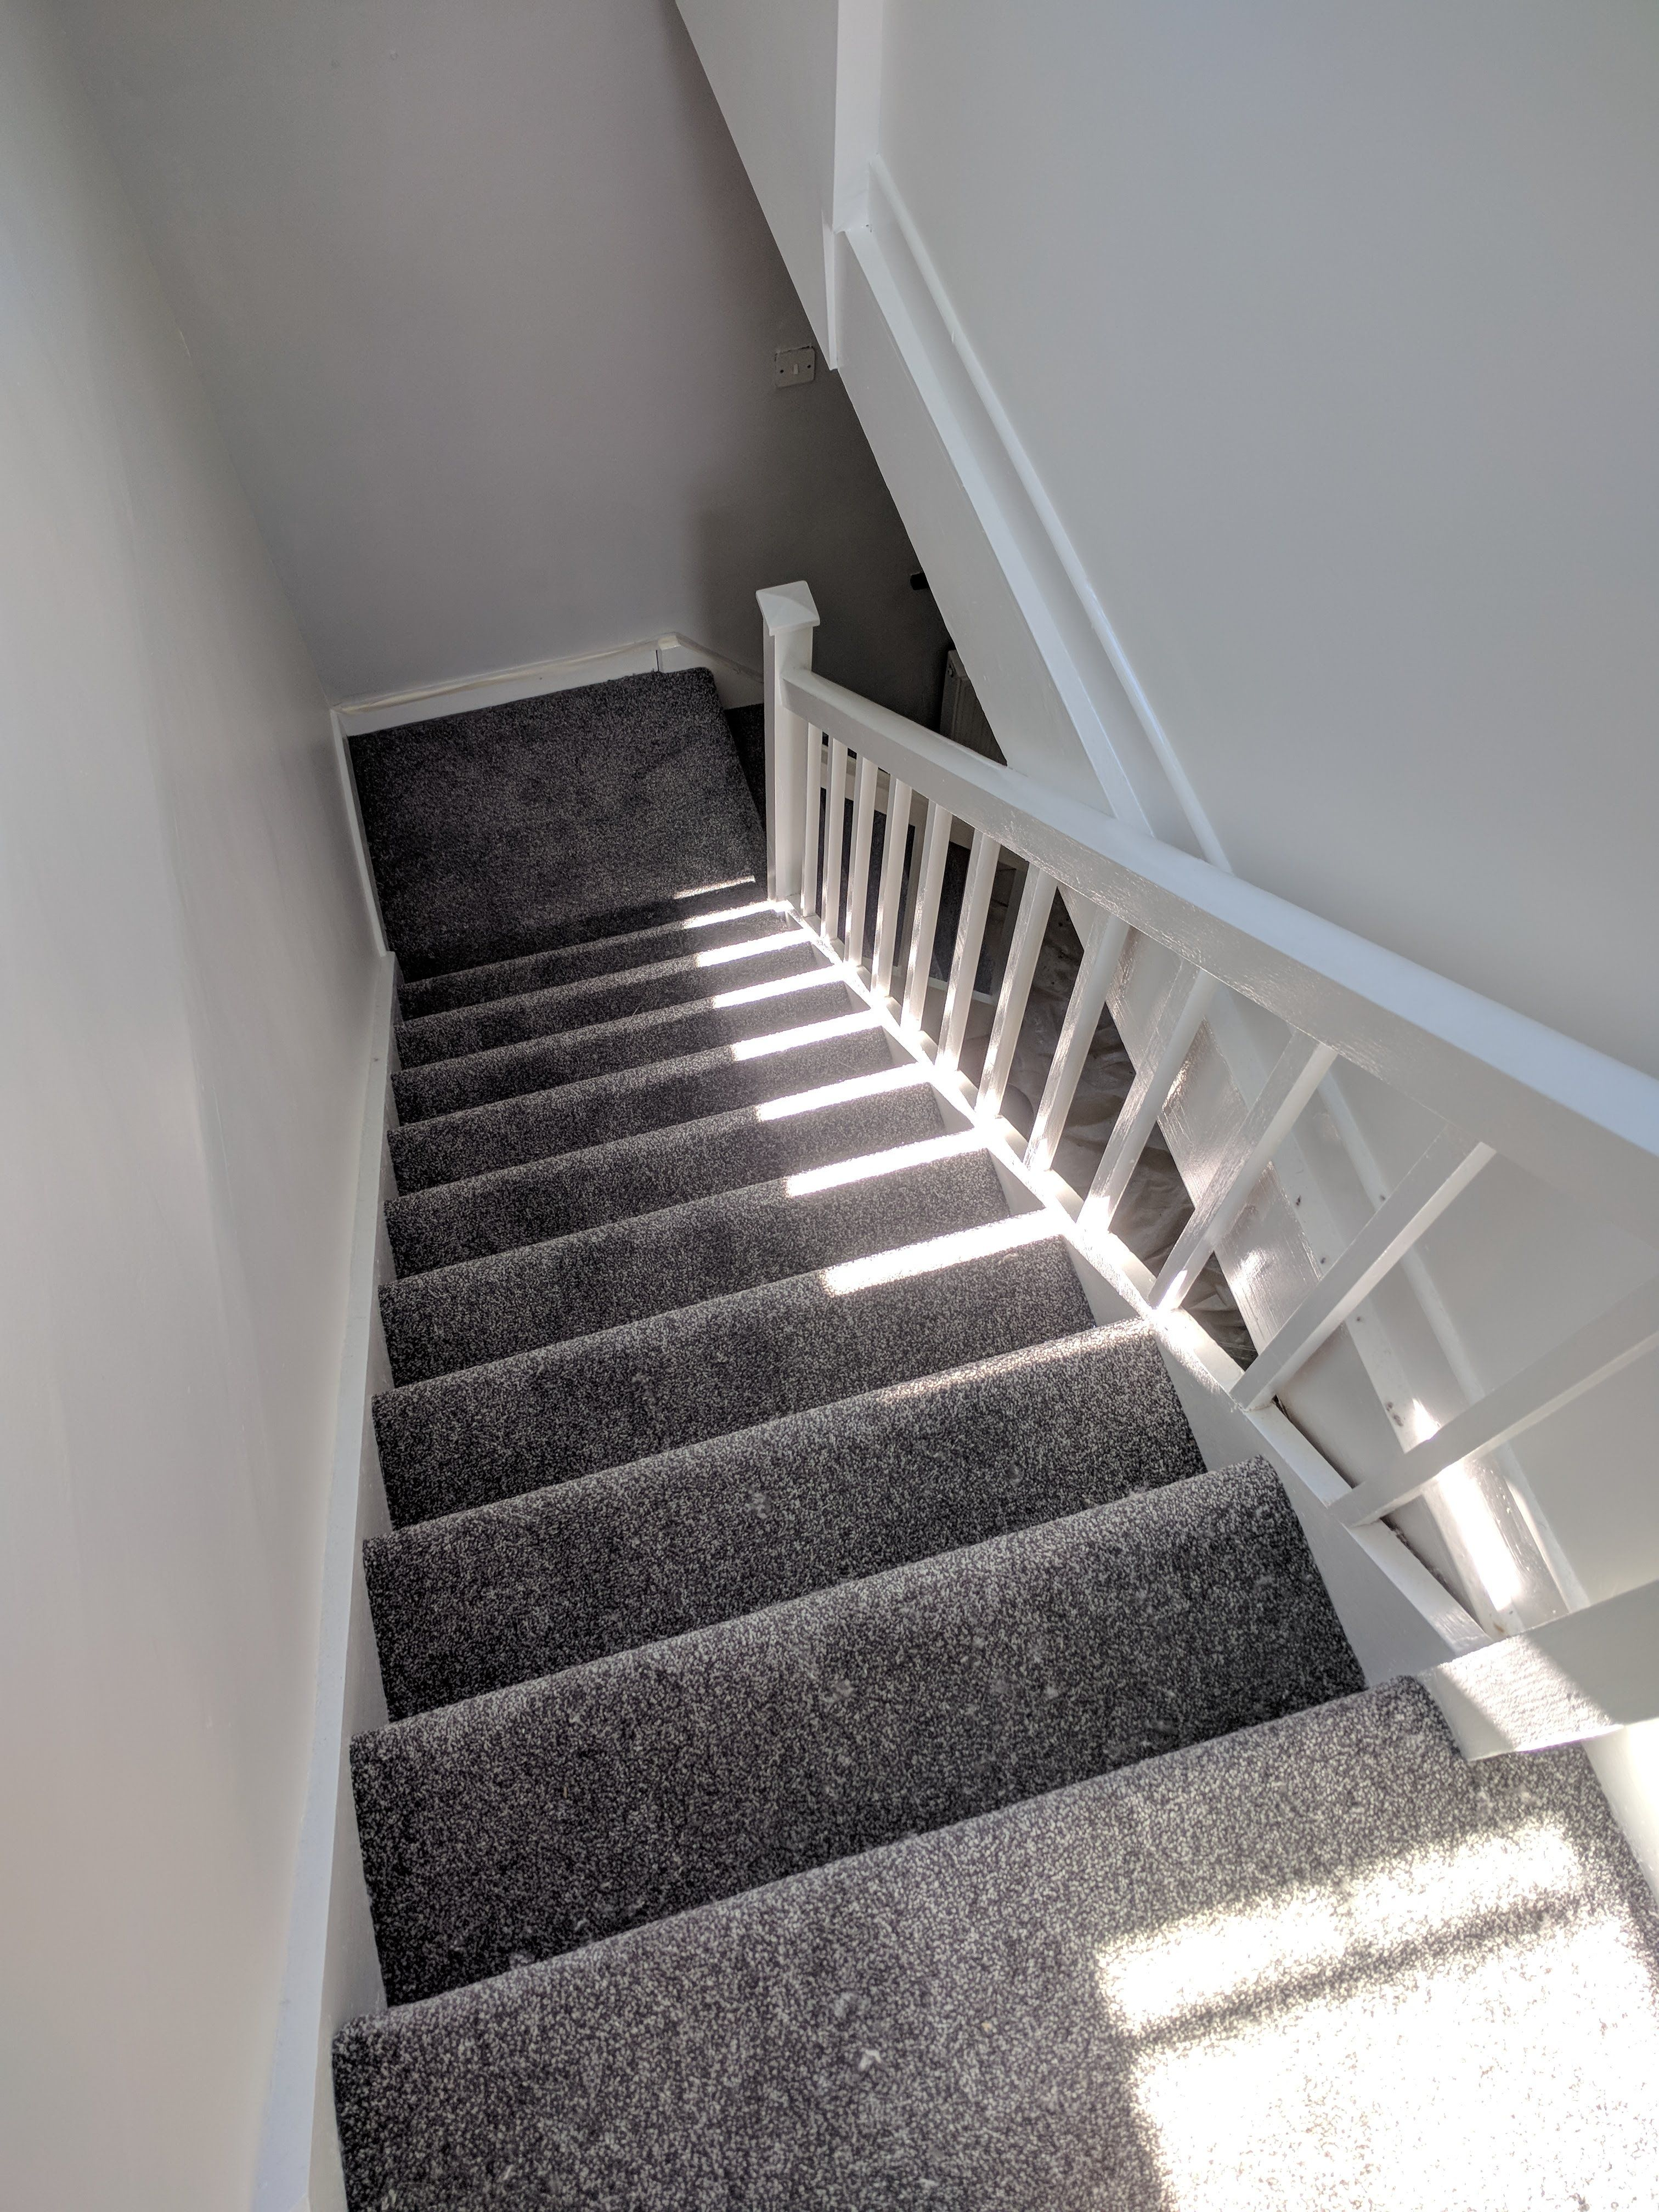 Dark Grey Carpet Install On Stairs And Landing Grey Stair | Gray Carpet On Stairs | Contemporary | Geometric | Design | Grey Pattern | Farmhouse